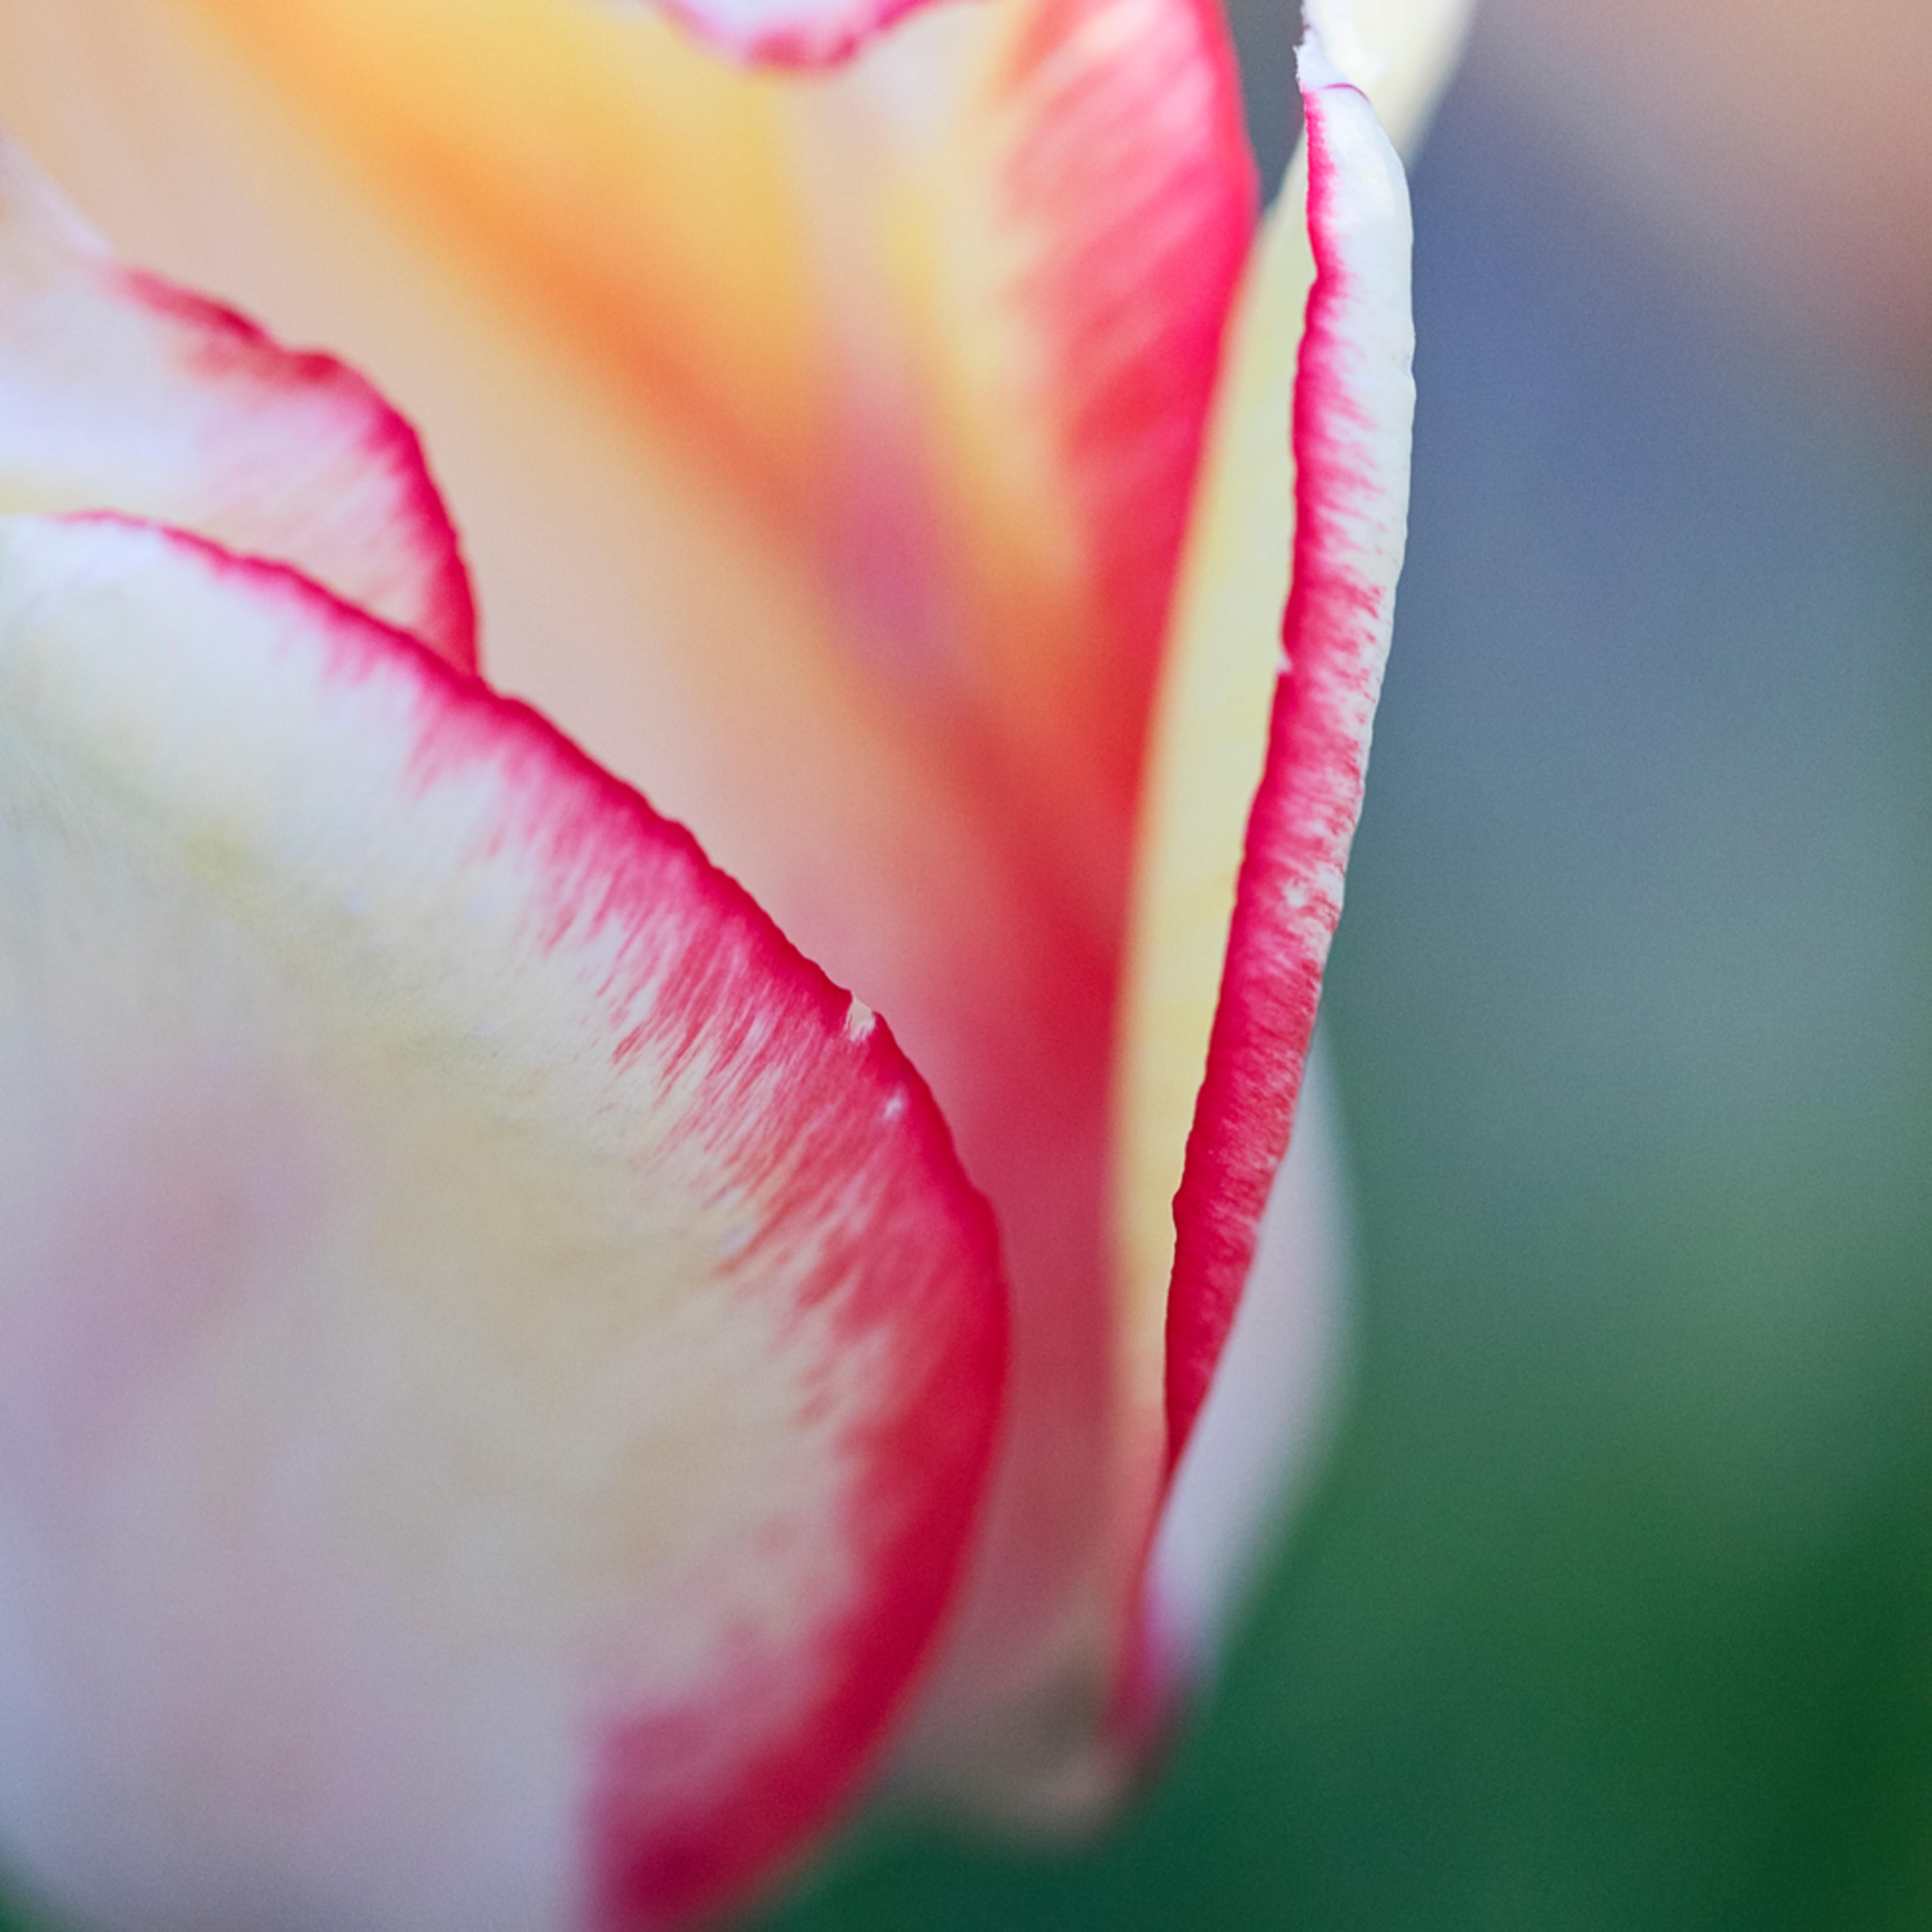 Wicked tulips farm johnston ri 20170503 3723 ual0oz